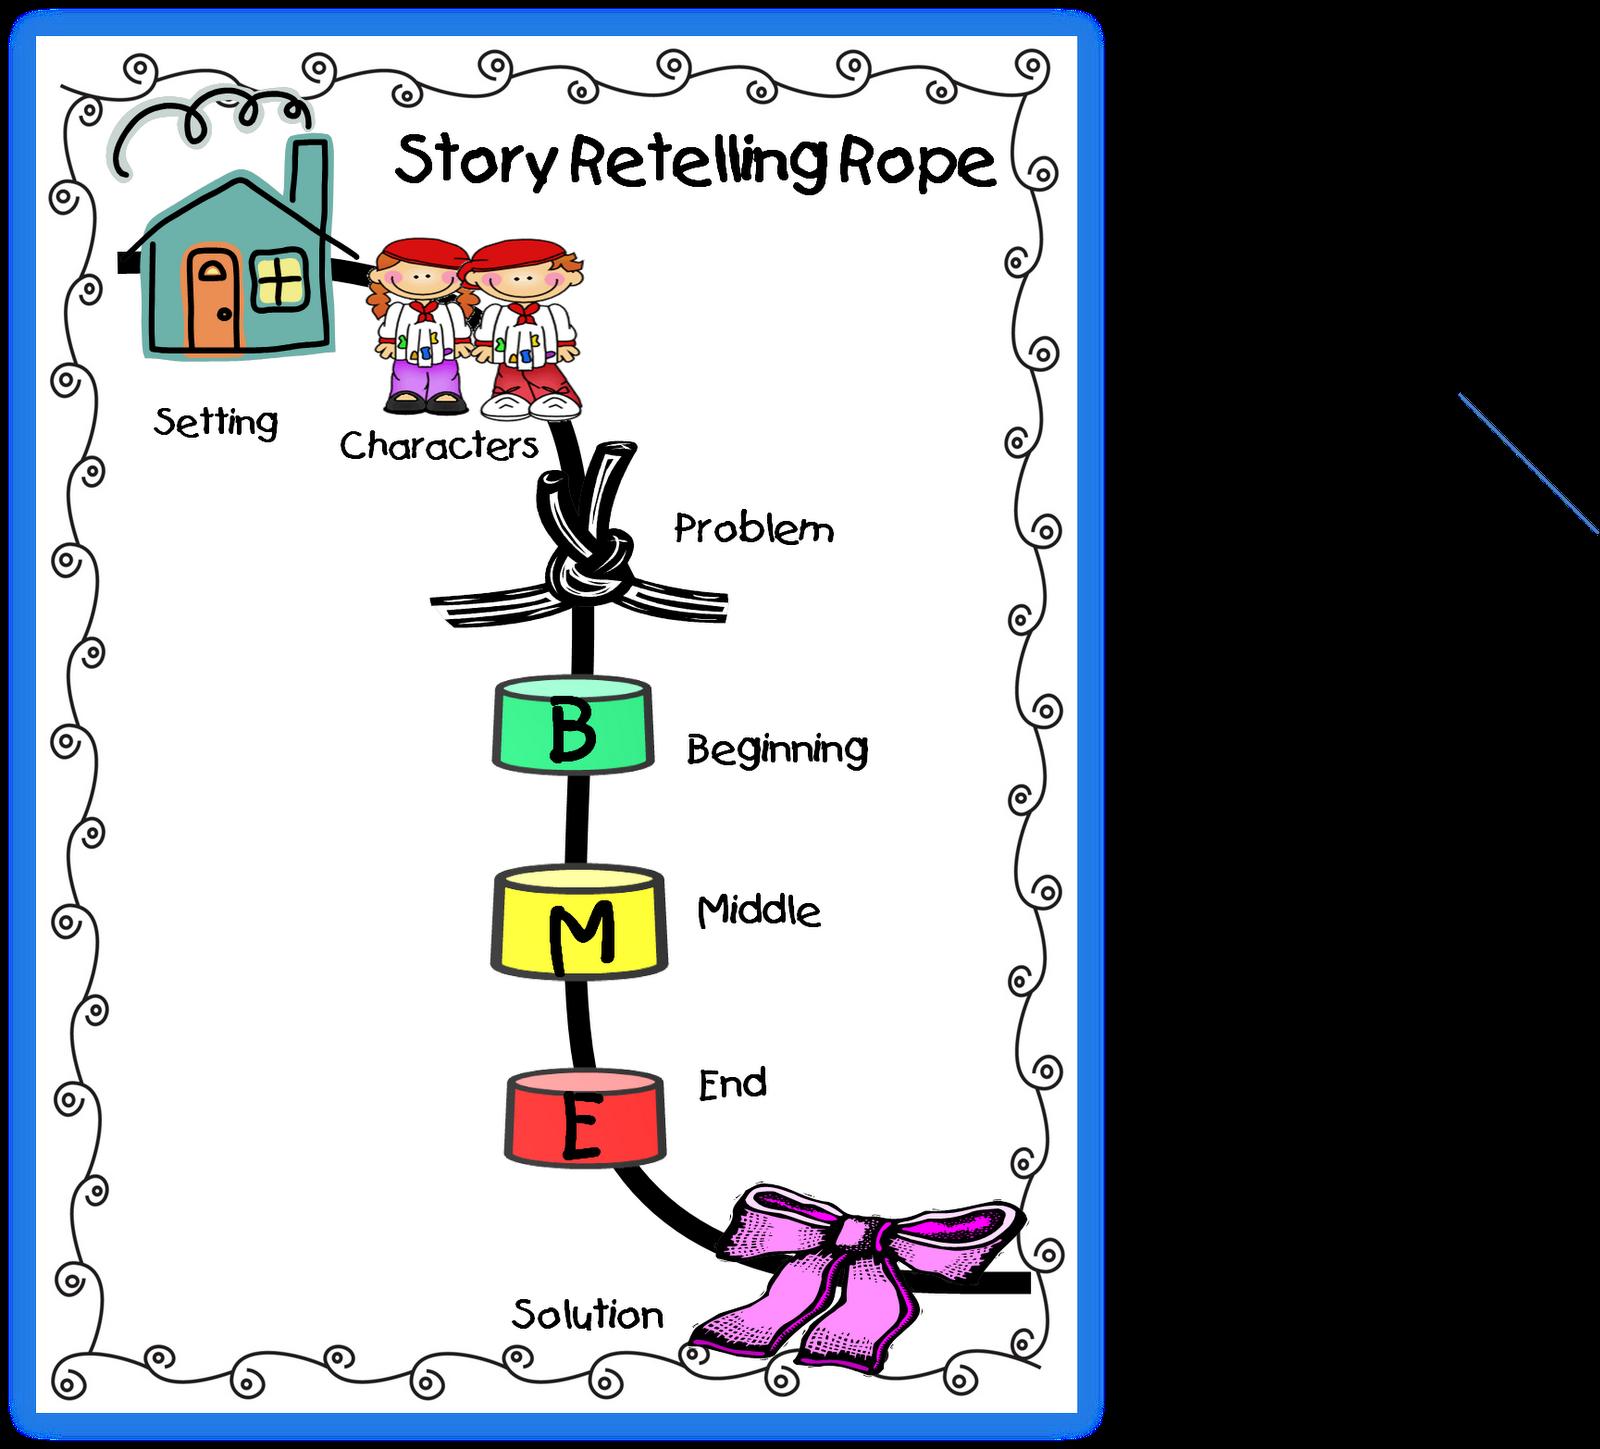 hight resolution of 22 Retelling rope ideas   retelling rope